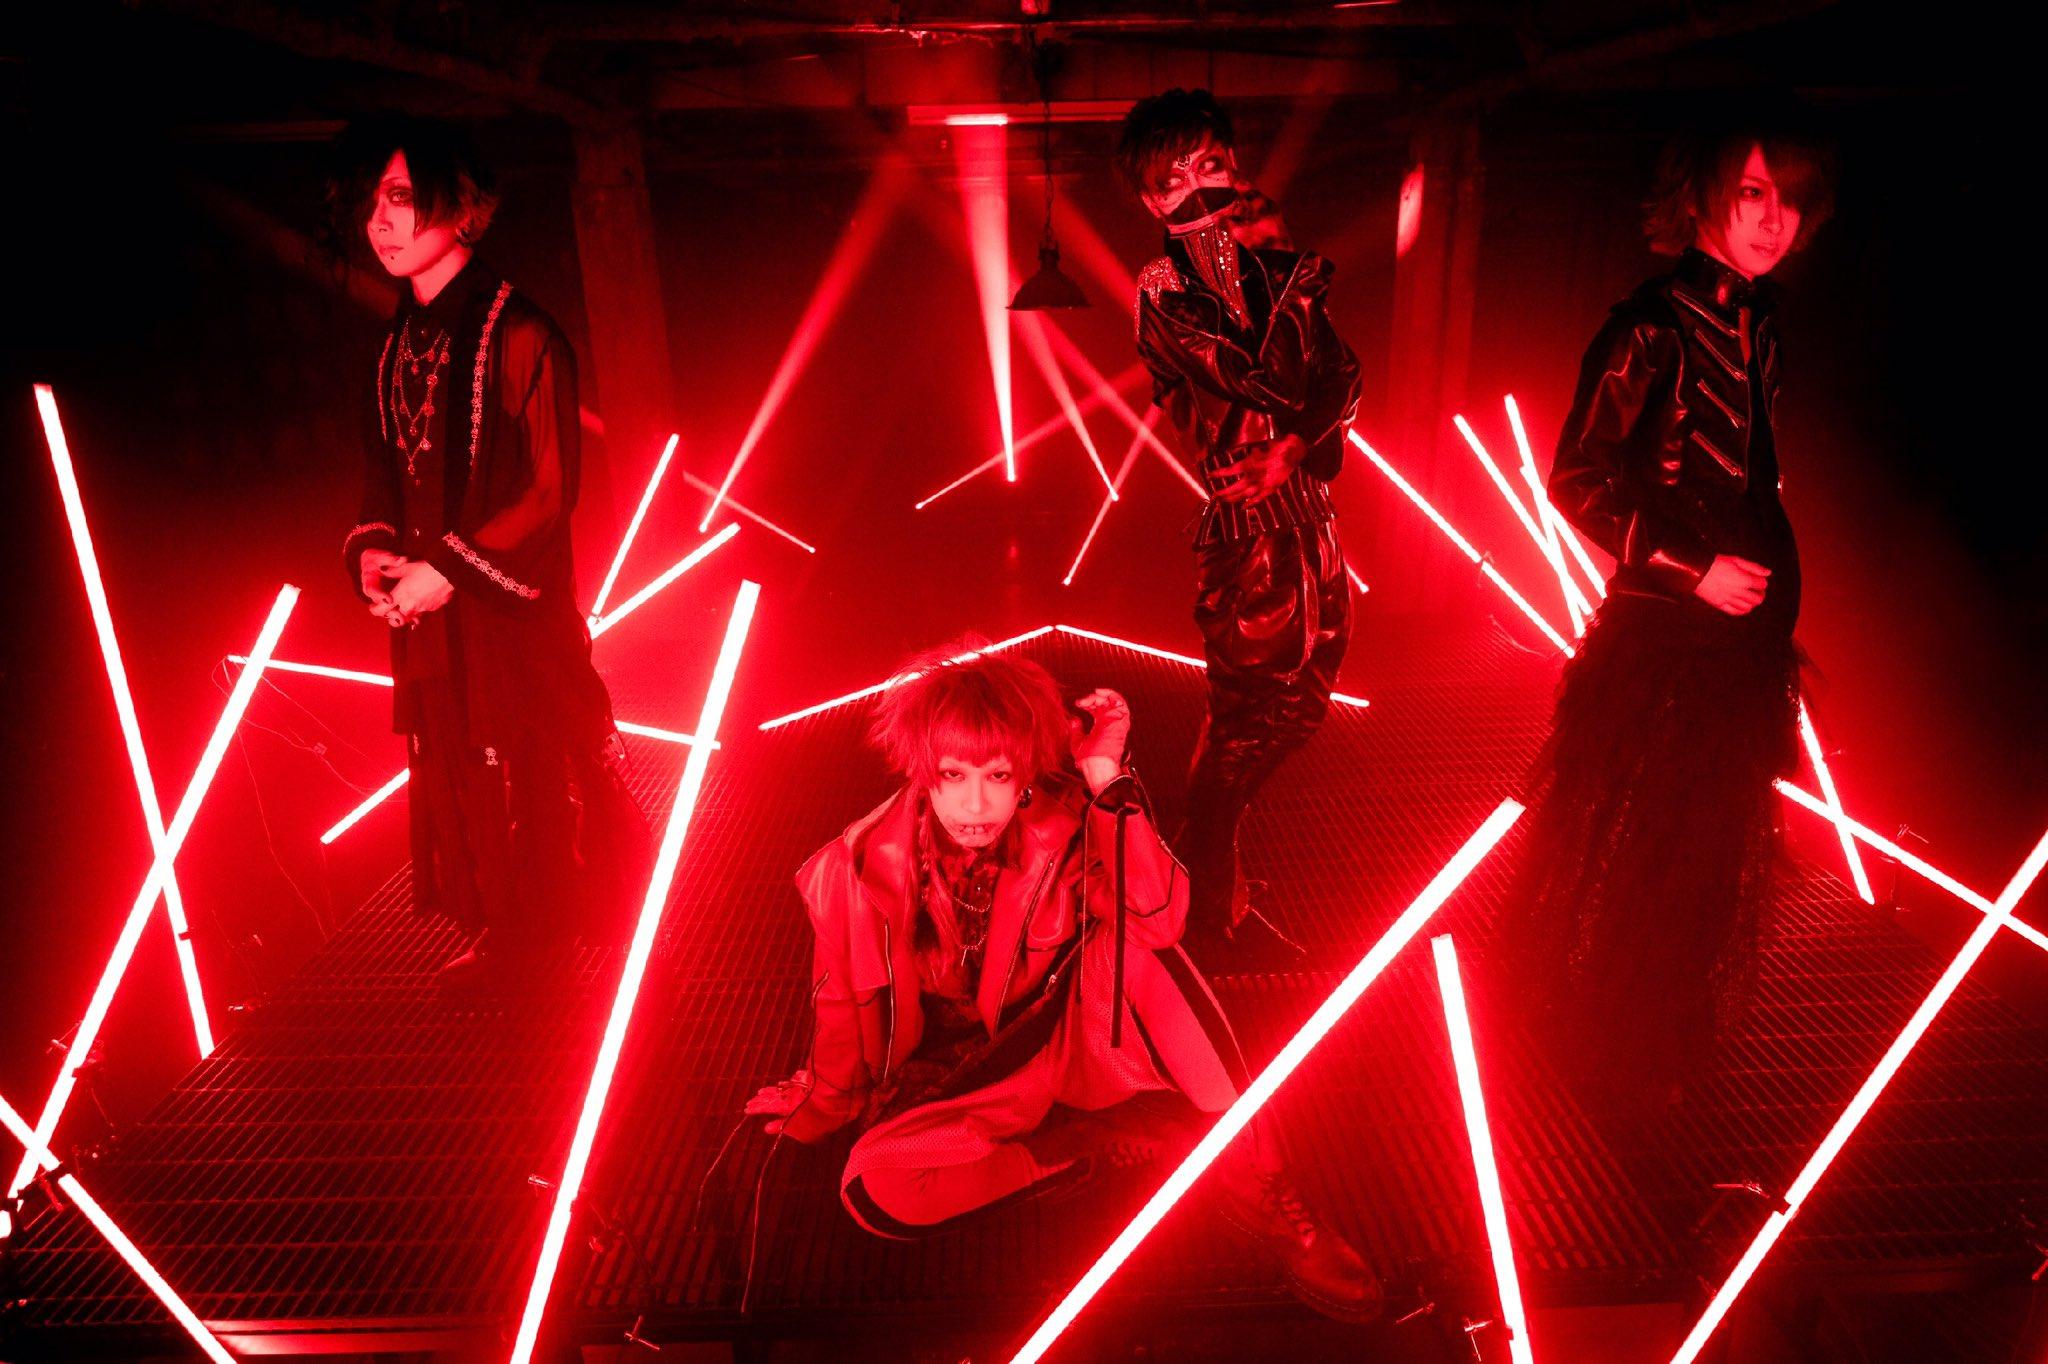 Codomo Dragon : 16th Oneman Tour Final『Hello, ANONYMOUS』~2020.01.05 TSUTAYA O-EAST~ (live DVD)